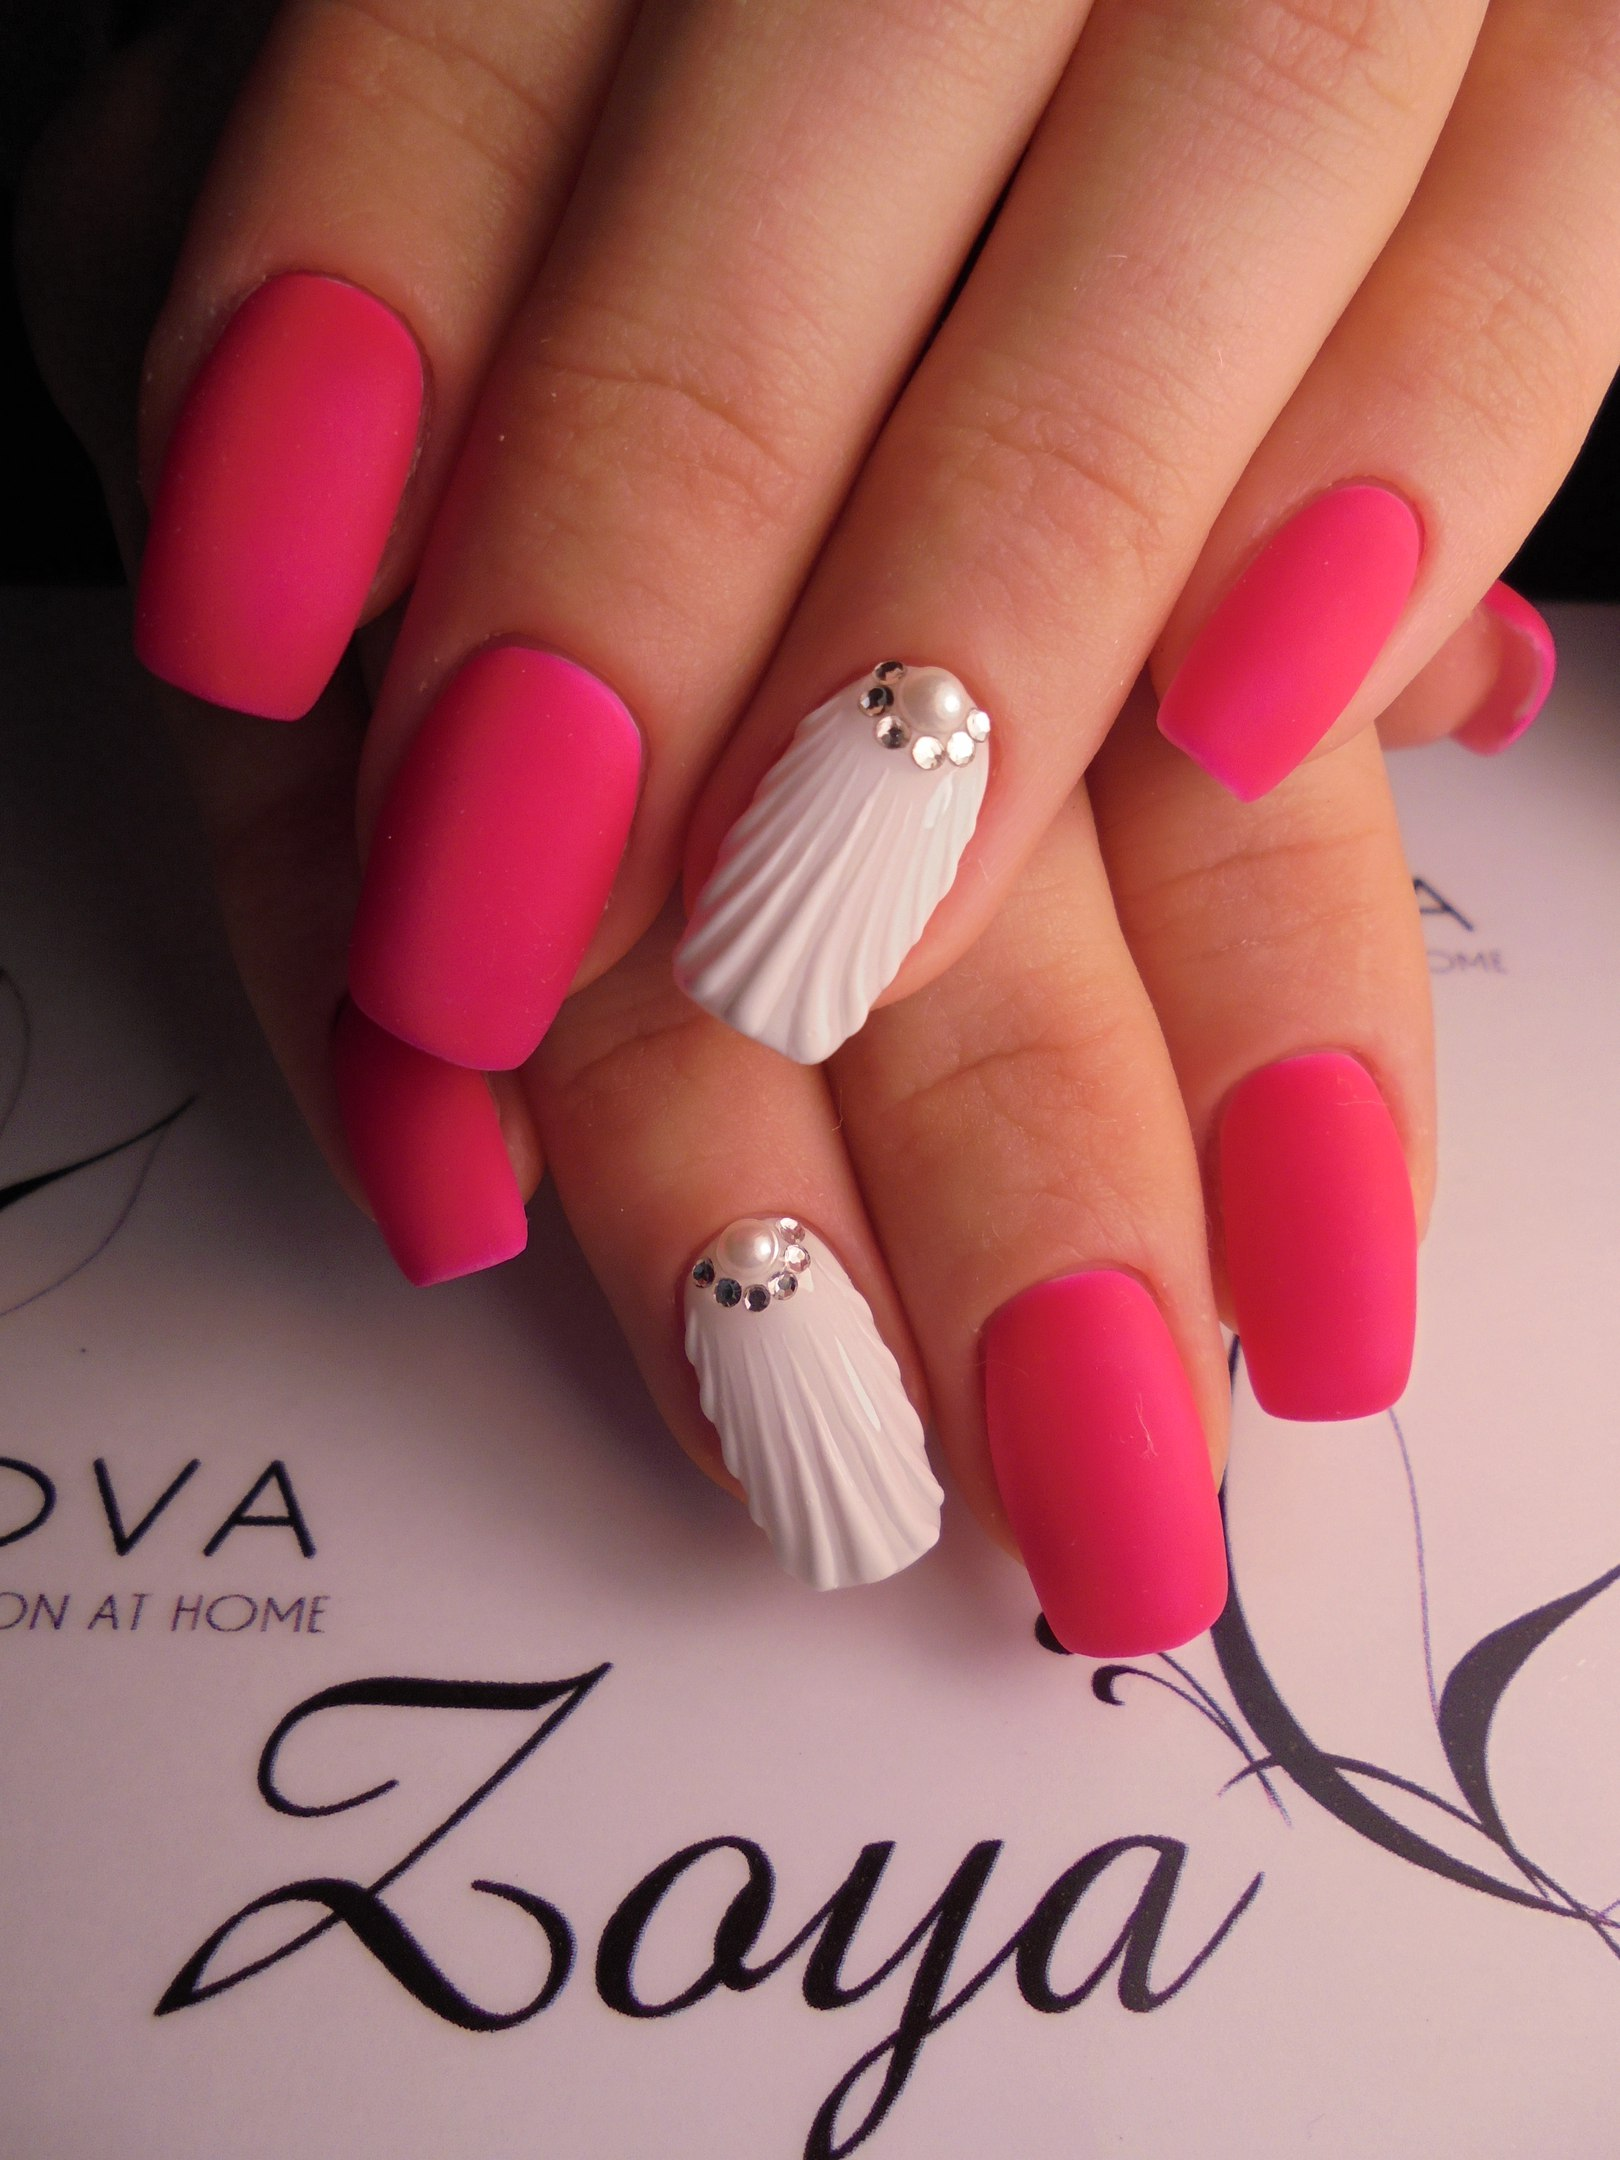 Дизайн «Ракушки» на ногтях гель-лаком 29